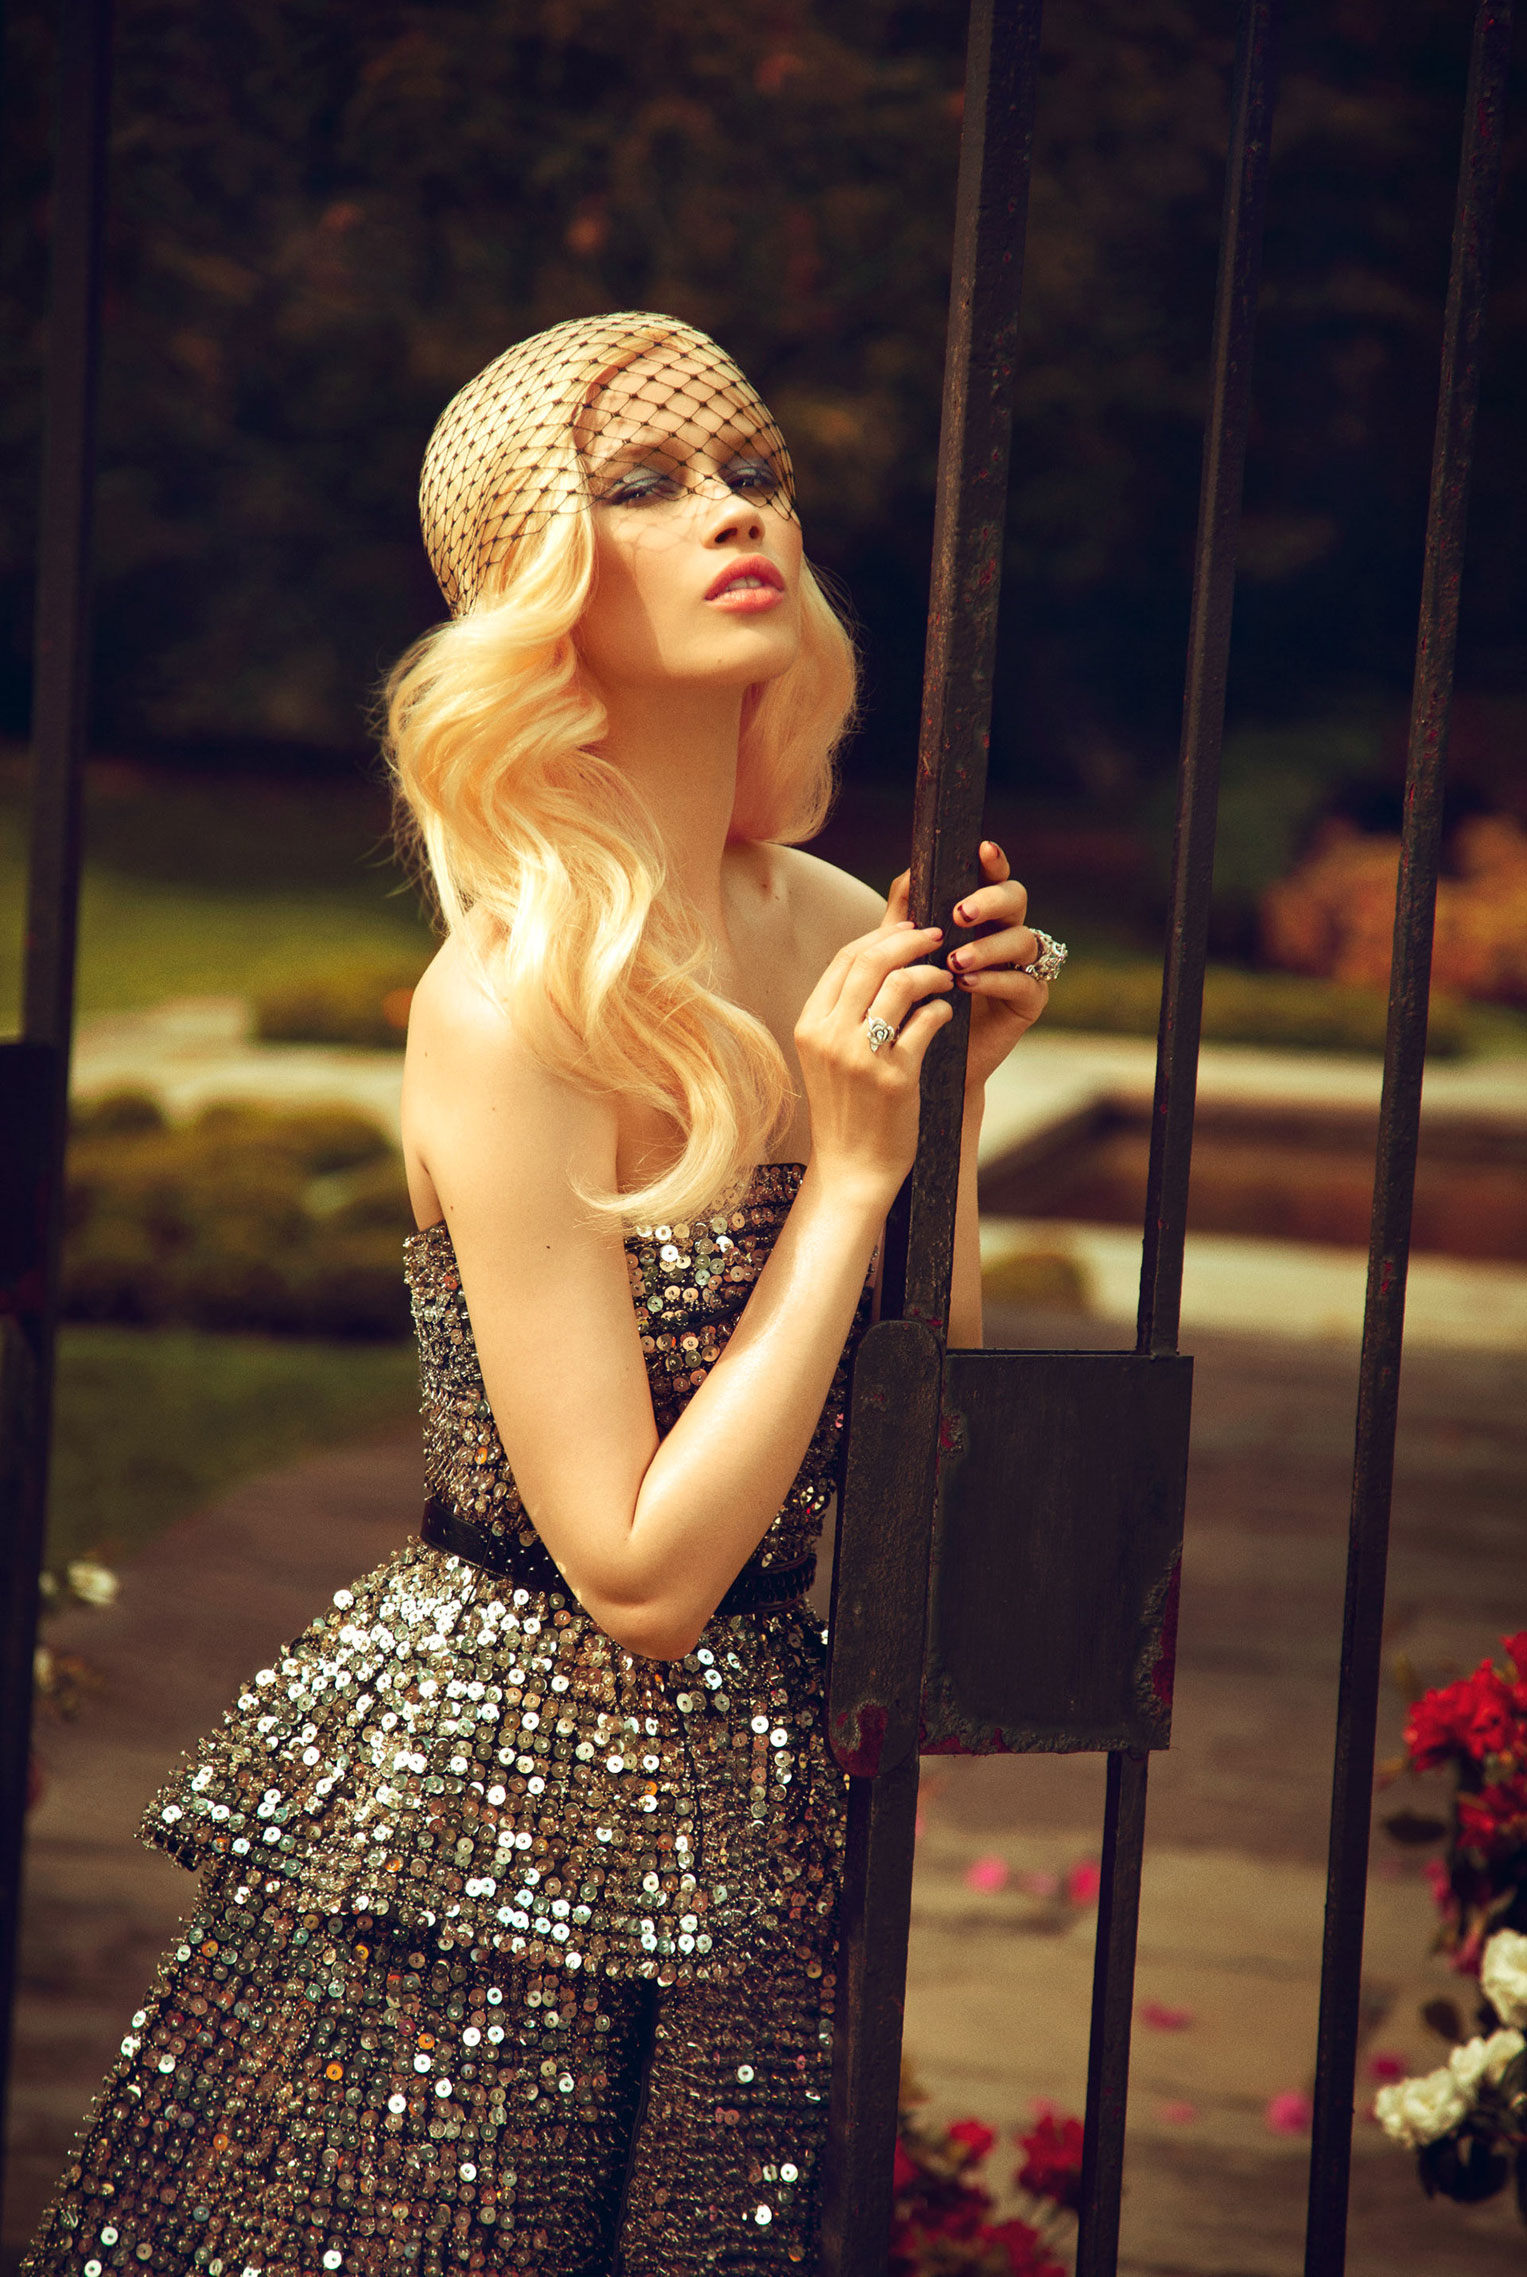 Раня Морданова в садах Бронкса / Ranya Mordanova by Yossi Michaeli - Luxury London Magazine june 2013